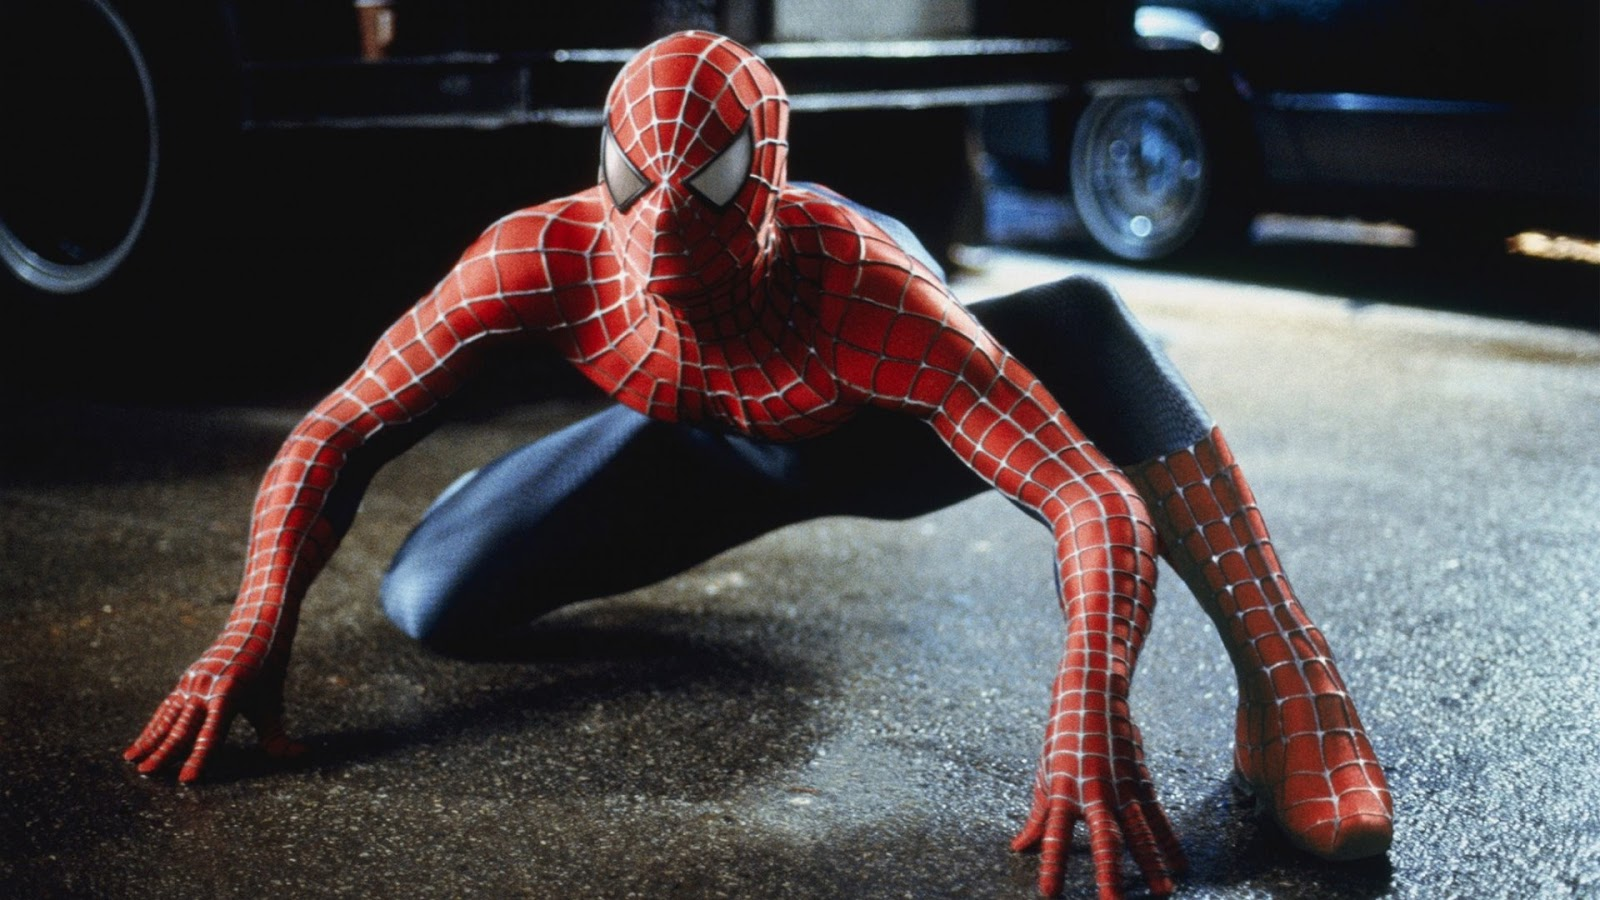 Marvel Spiderman HD Background